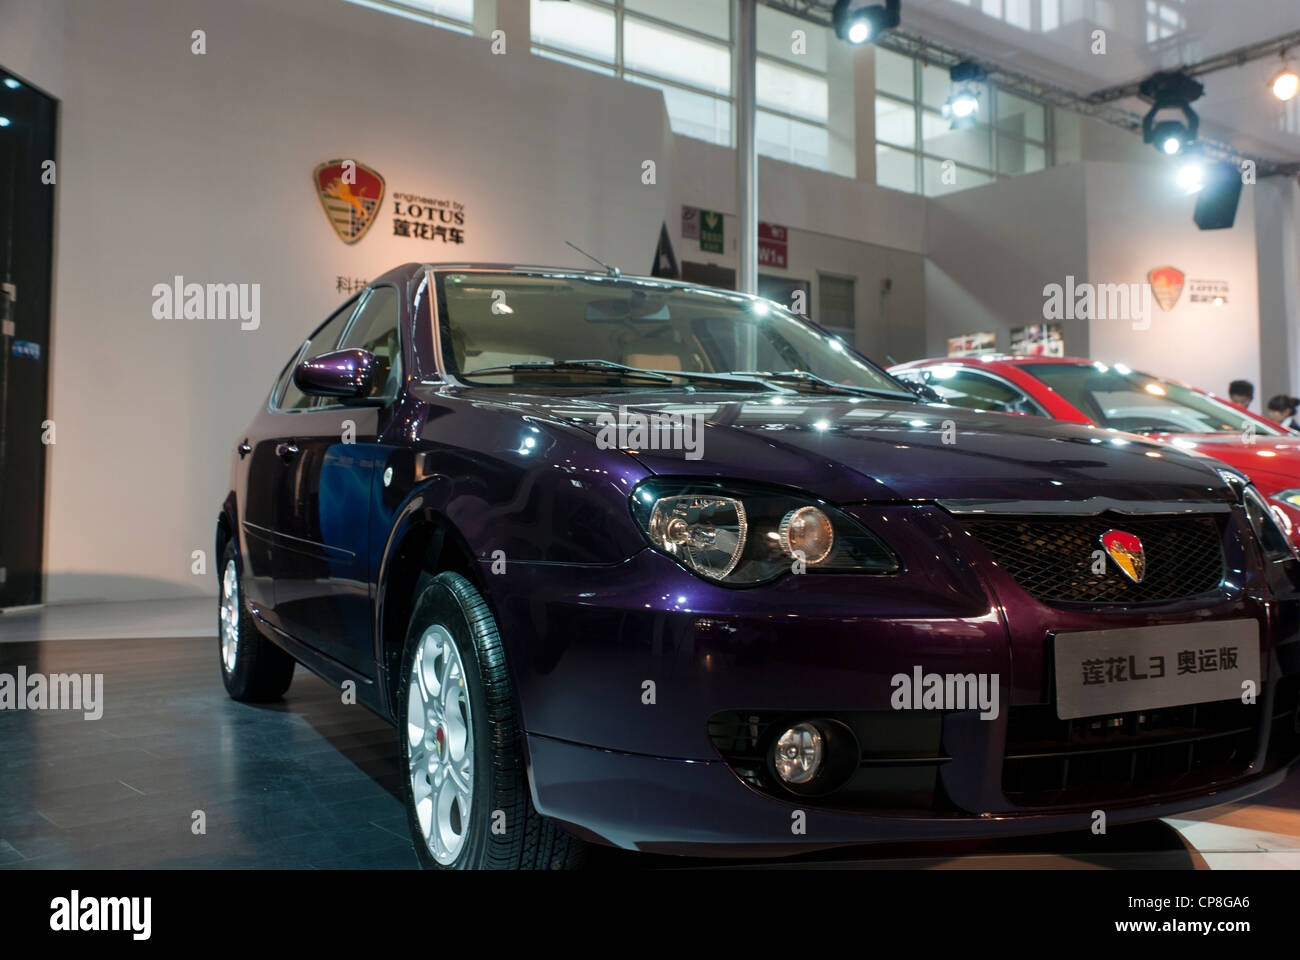 Lotus Cars - Stock Image